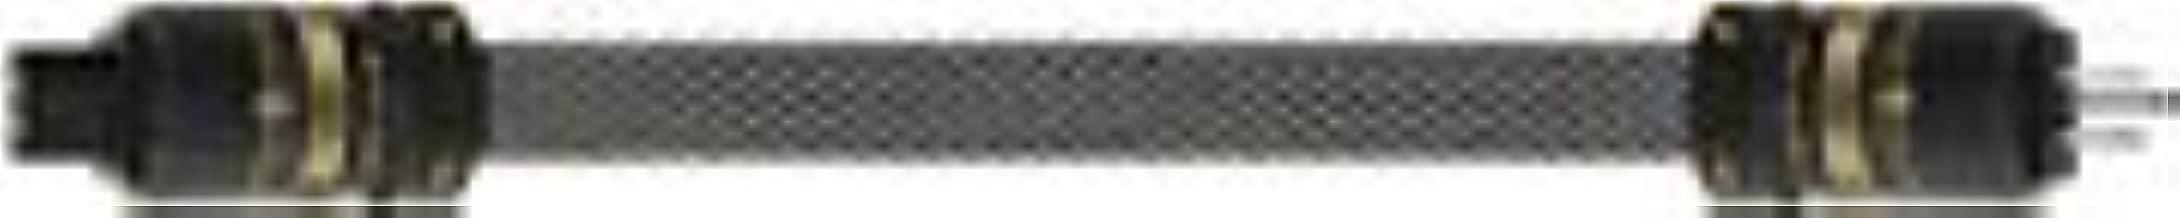 wireworld platinum electra 7 power cord